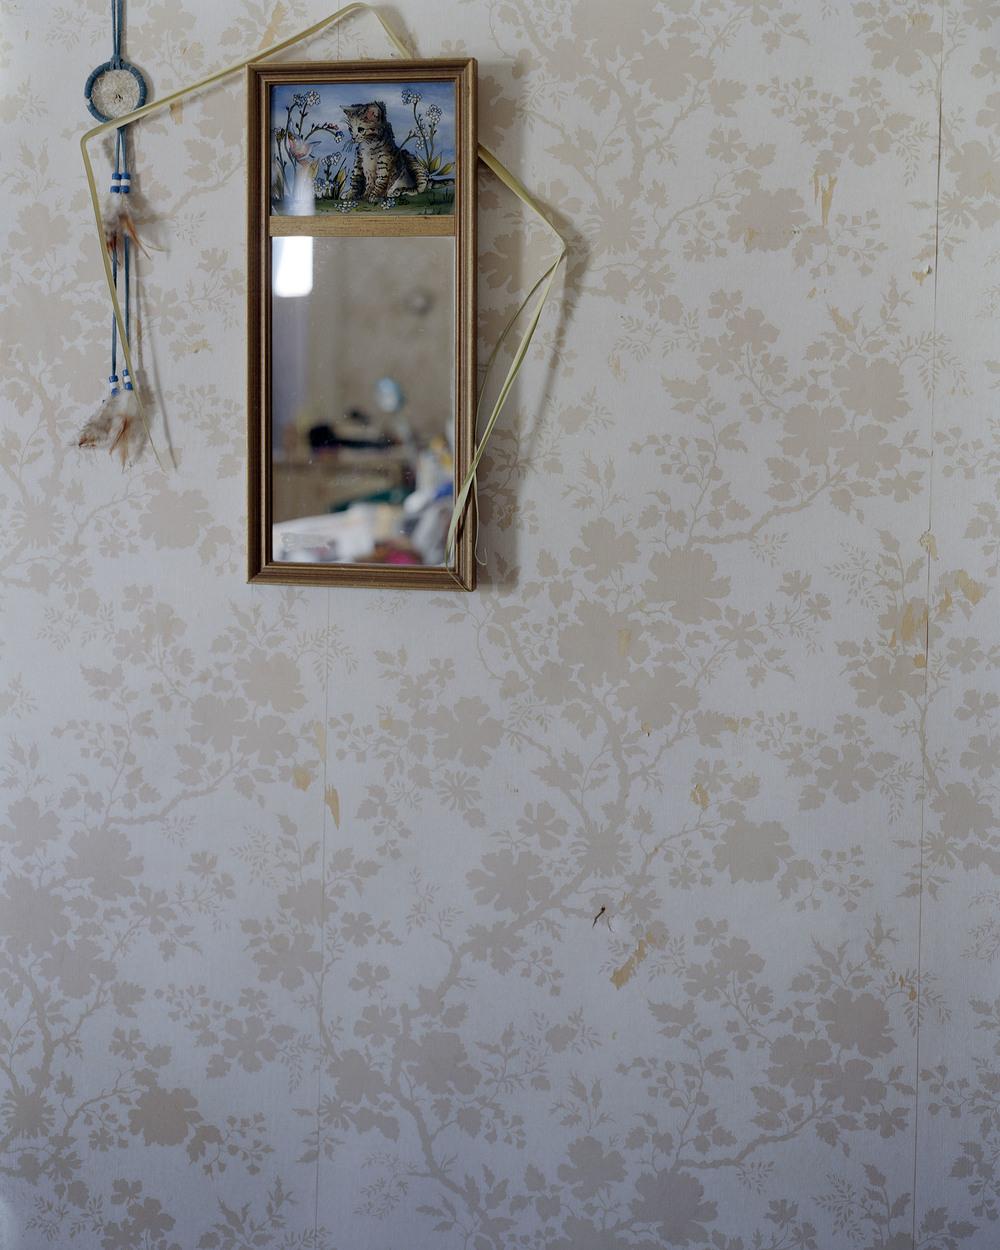 mirror-cat.jpg